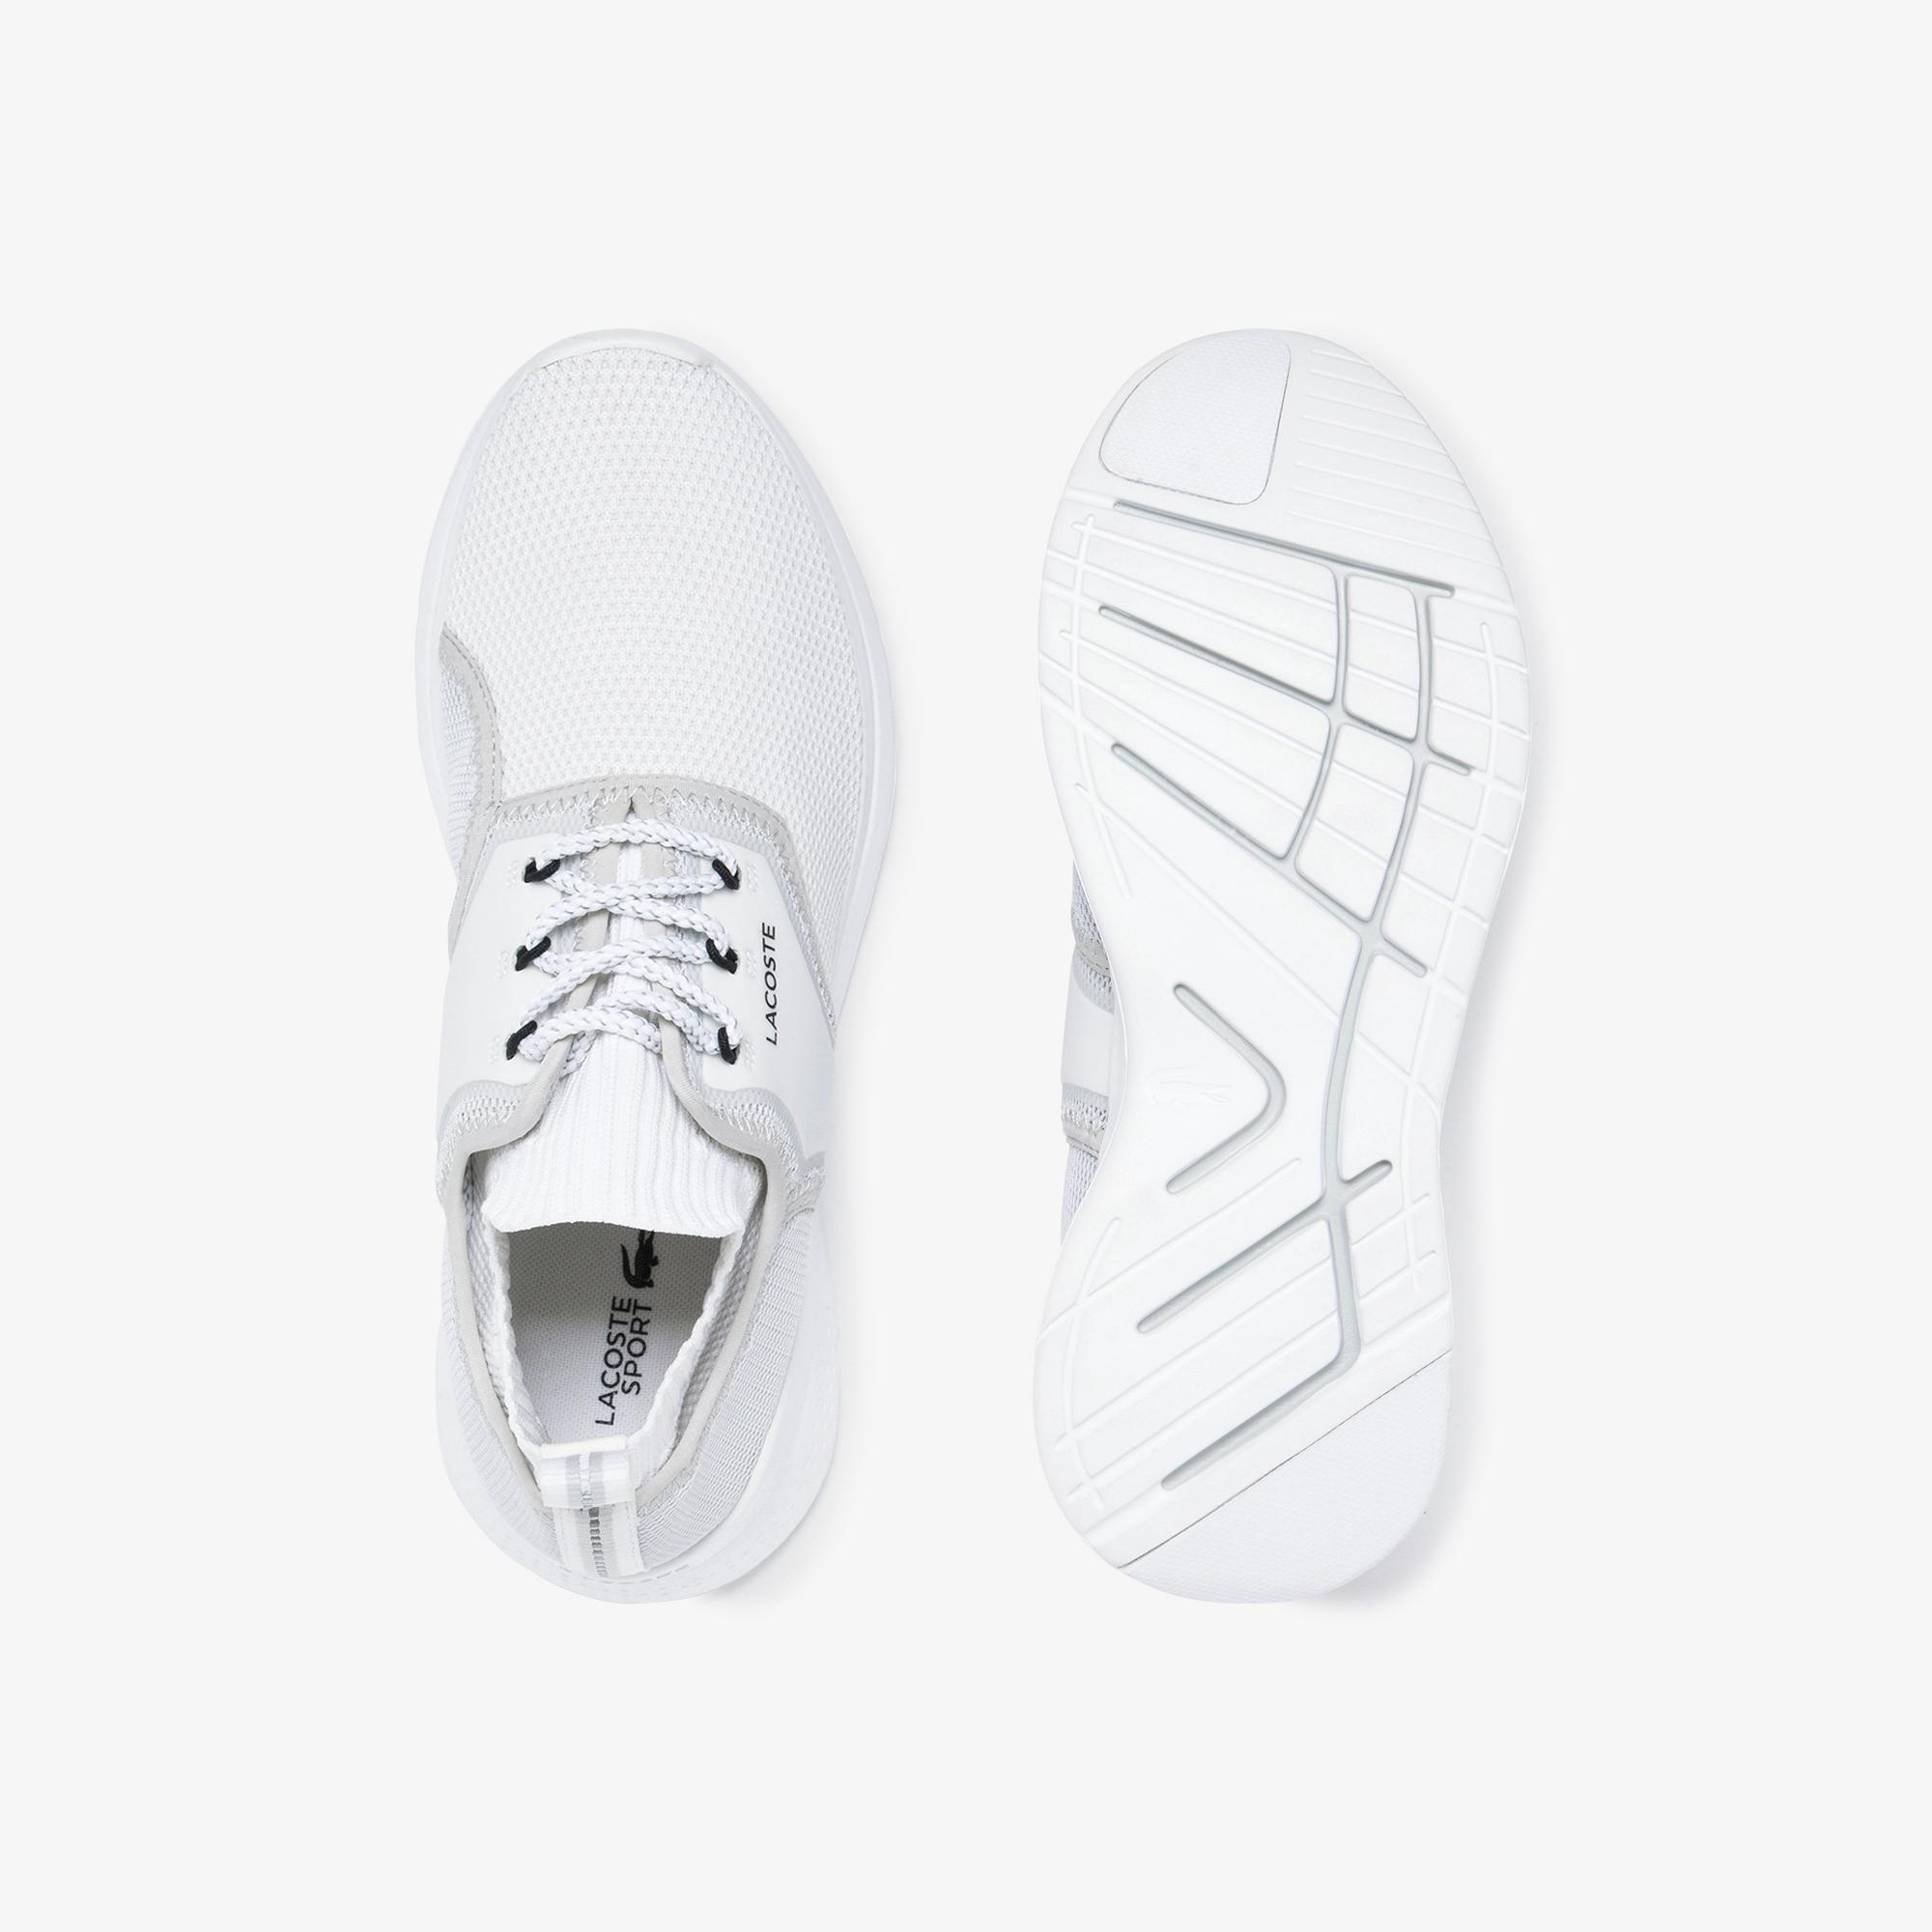 Lacoste Men's Lt Sense 120 1 Sma Leather Sneakers